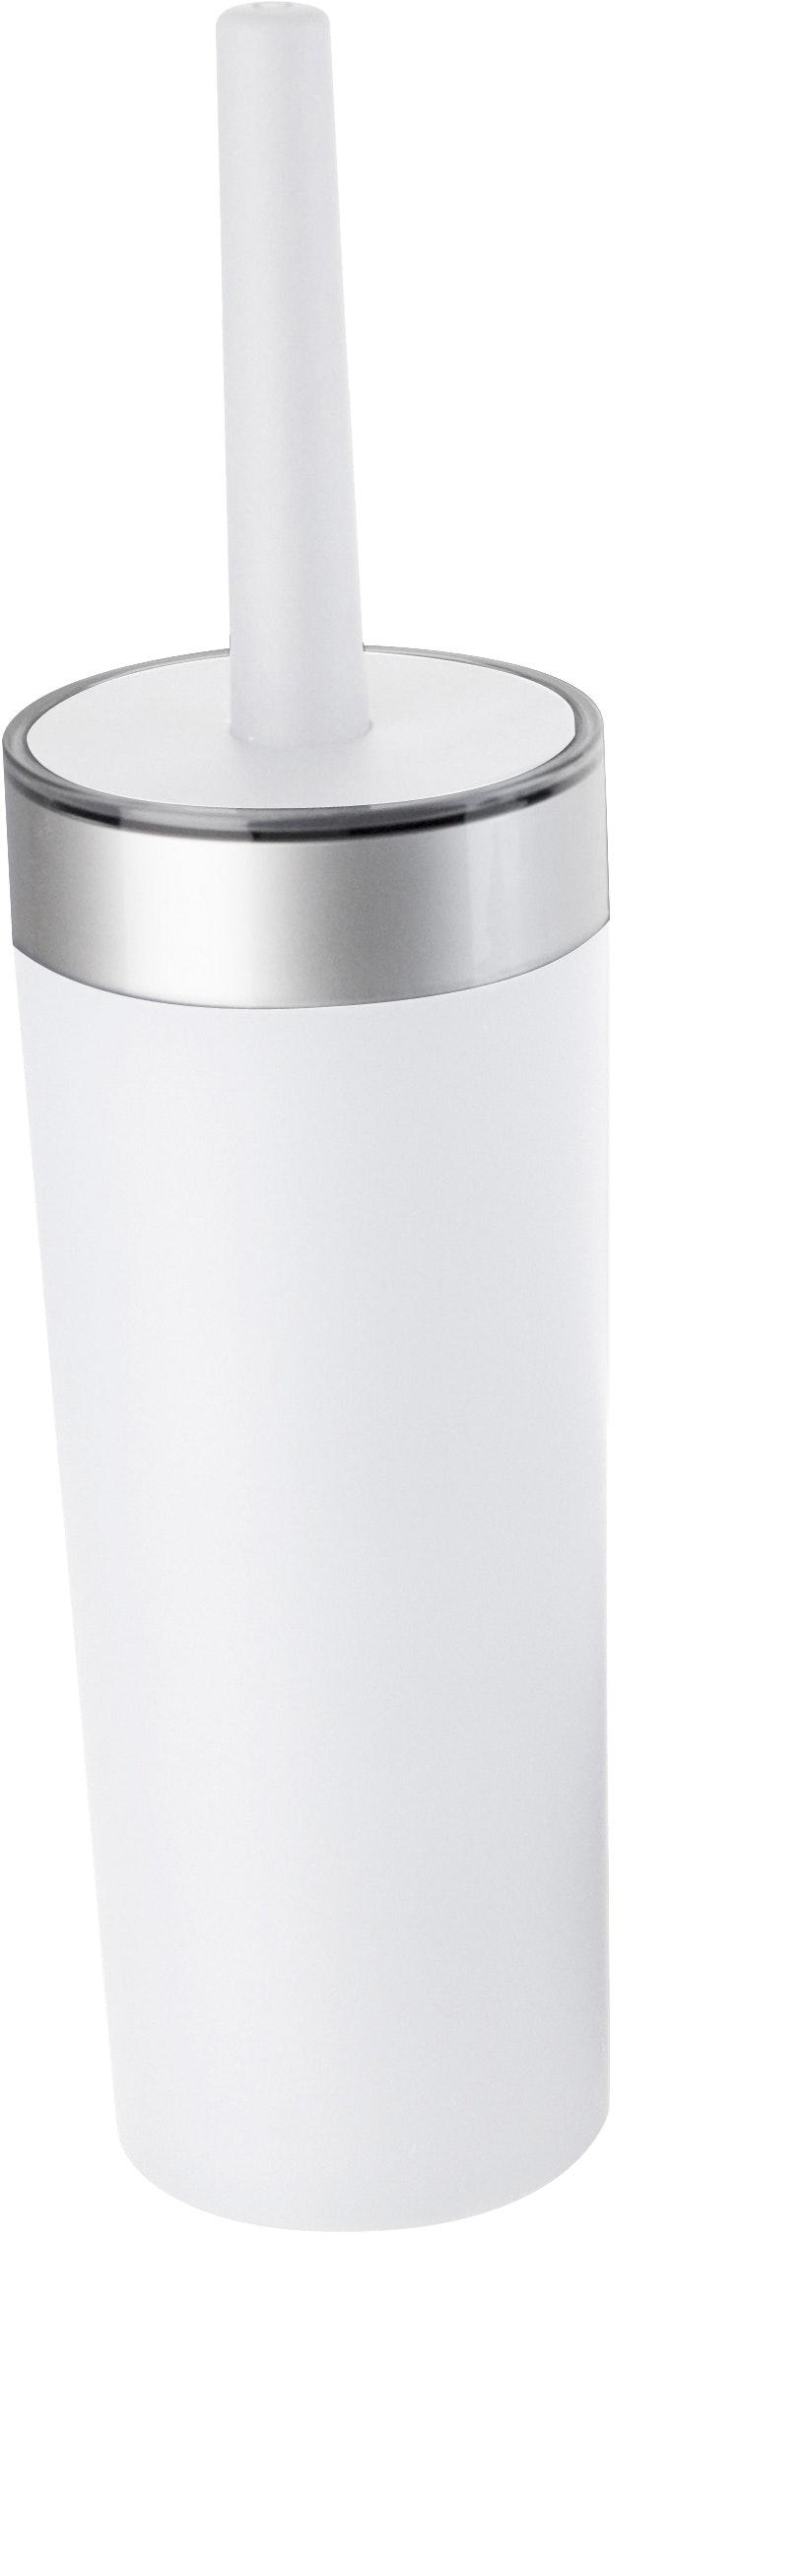 Toalettborste Duschy Sober Med behållare i Vit/Krom